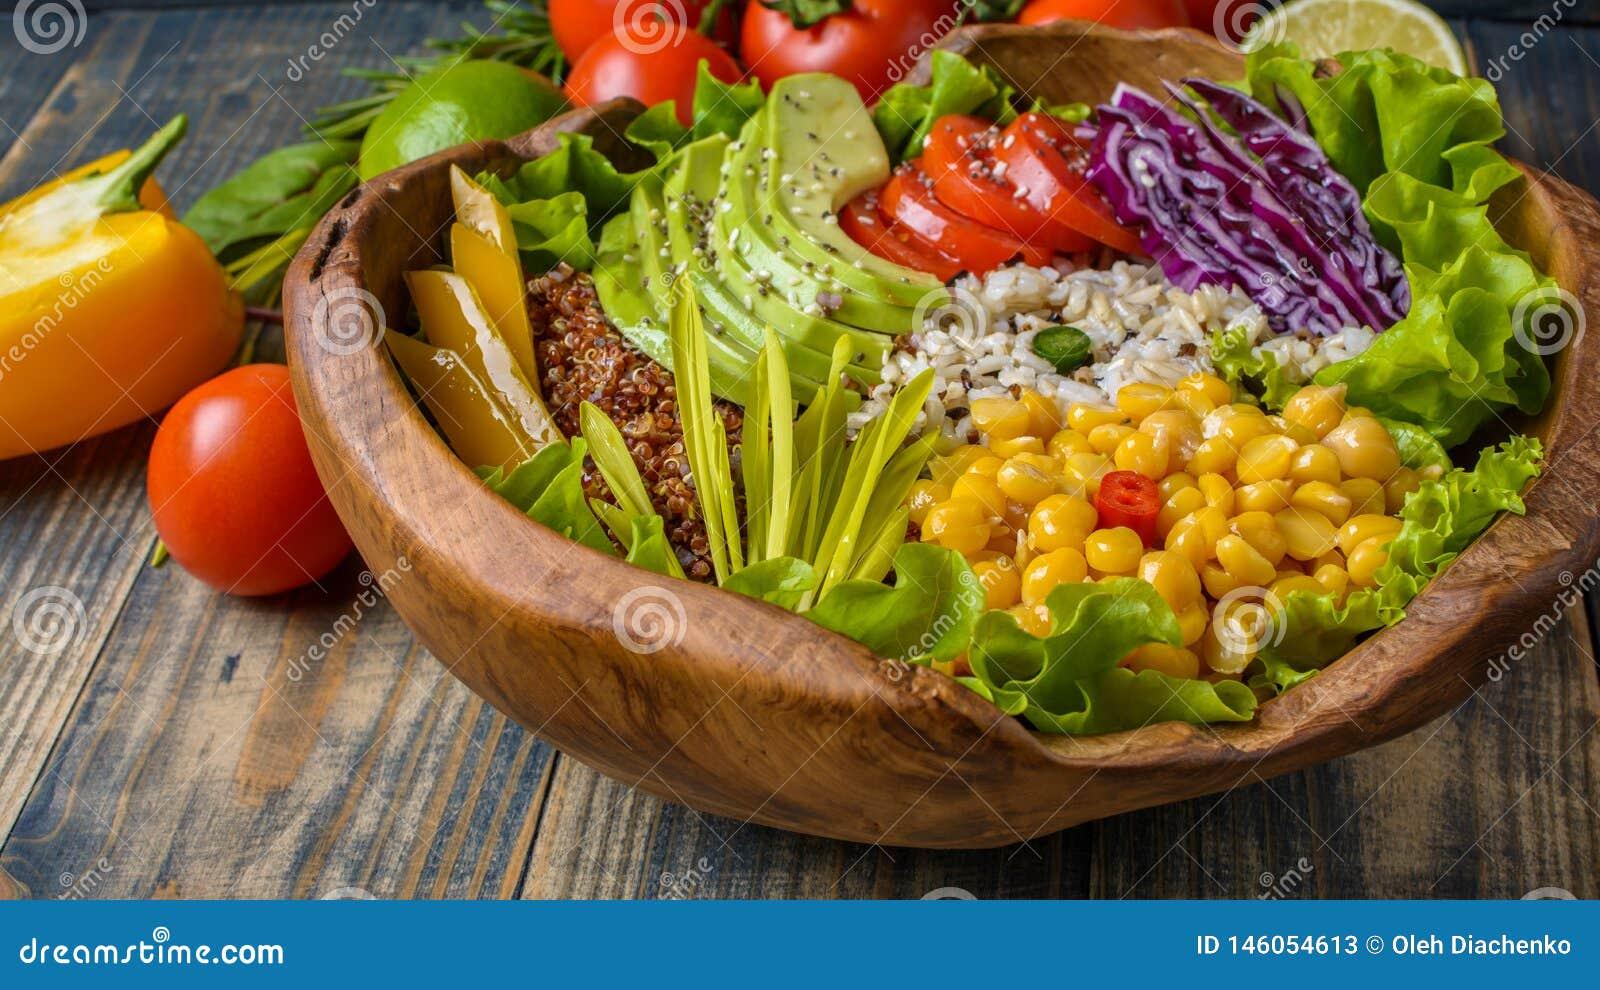 De kom van Boedha met kikkererwt, avocado, wilde rijst, quinoa zaden, groene paprika, tomaten, greens, kool, sla op oude sjofele